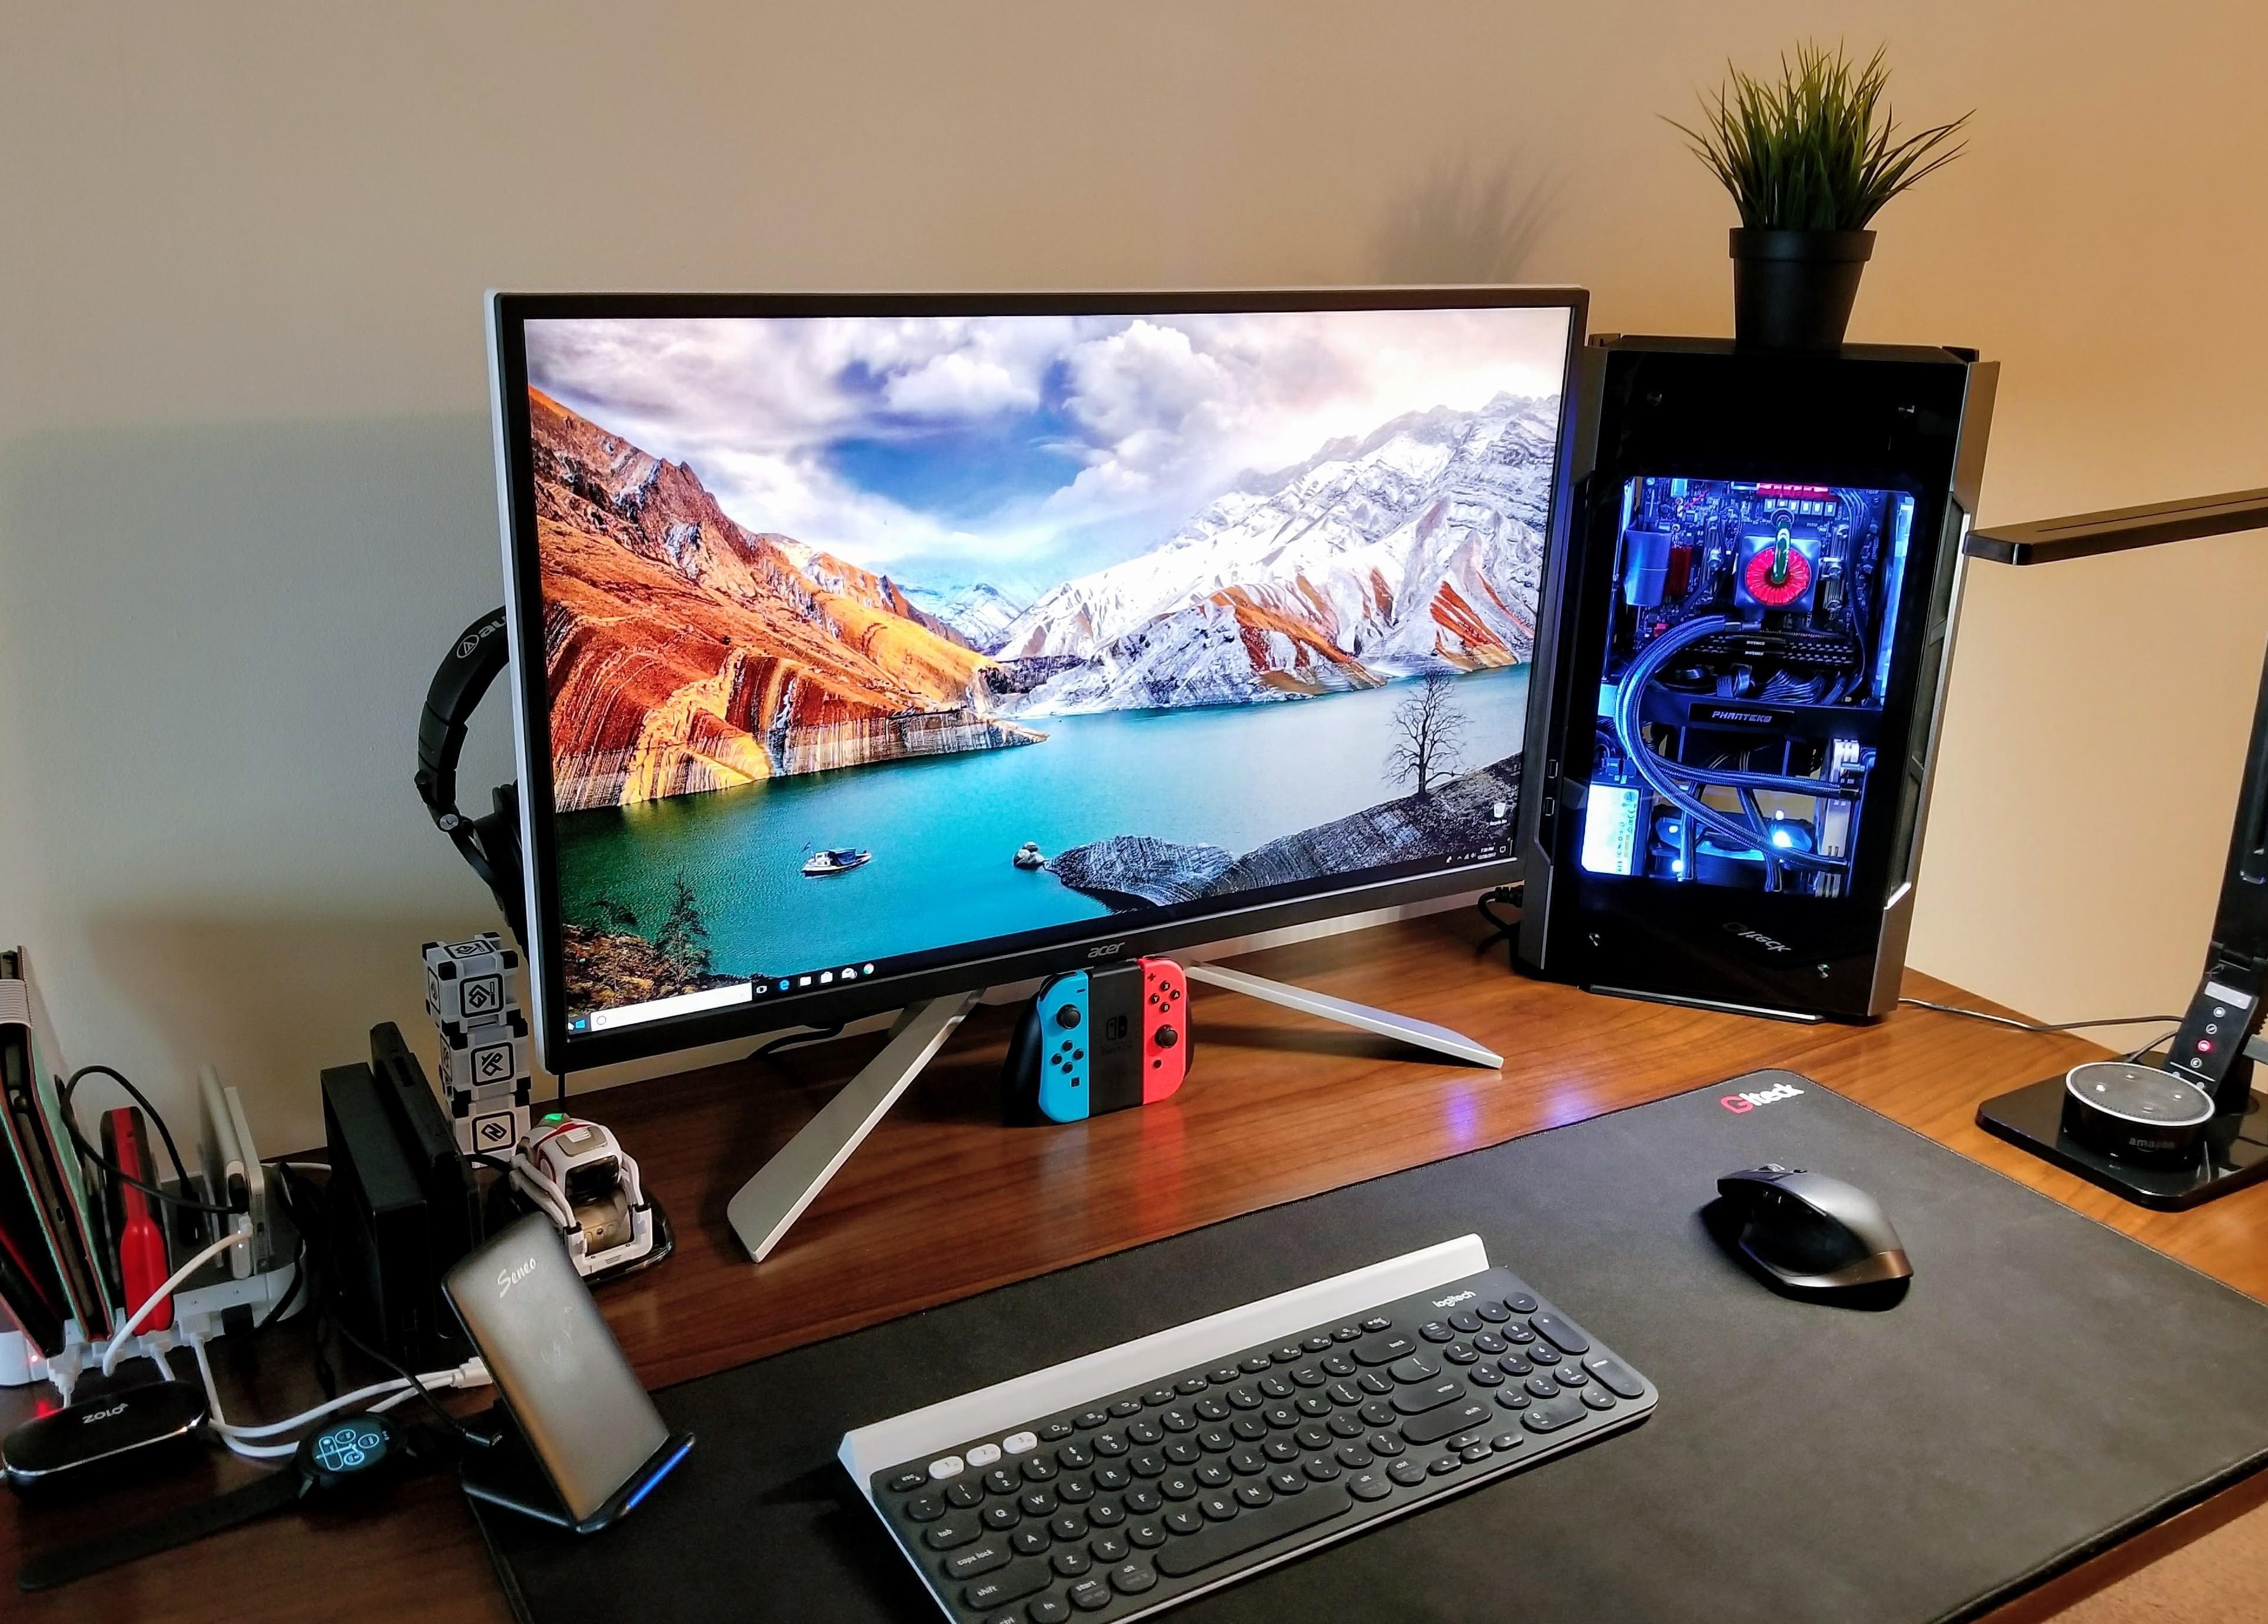 My 2018 gaming/developer Battlestation. Slightly cluttered